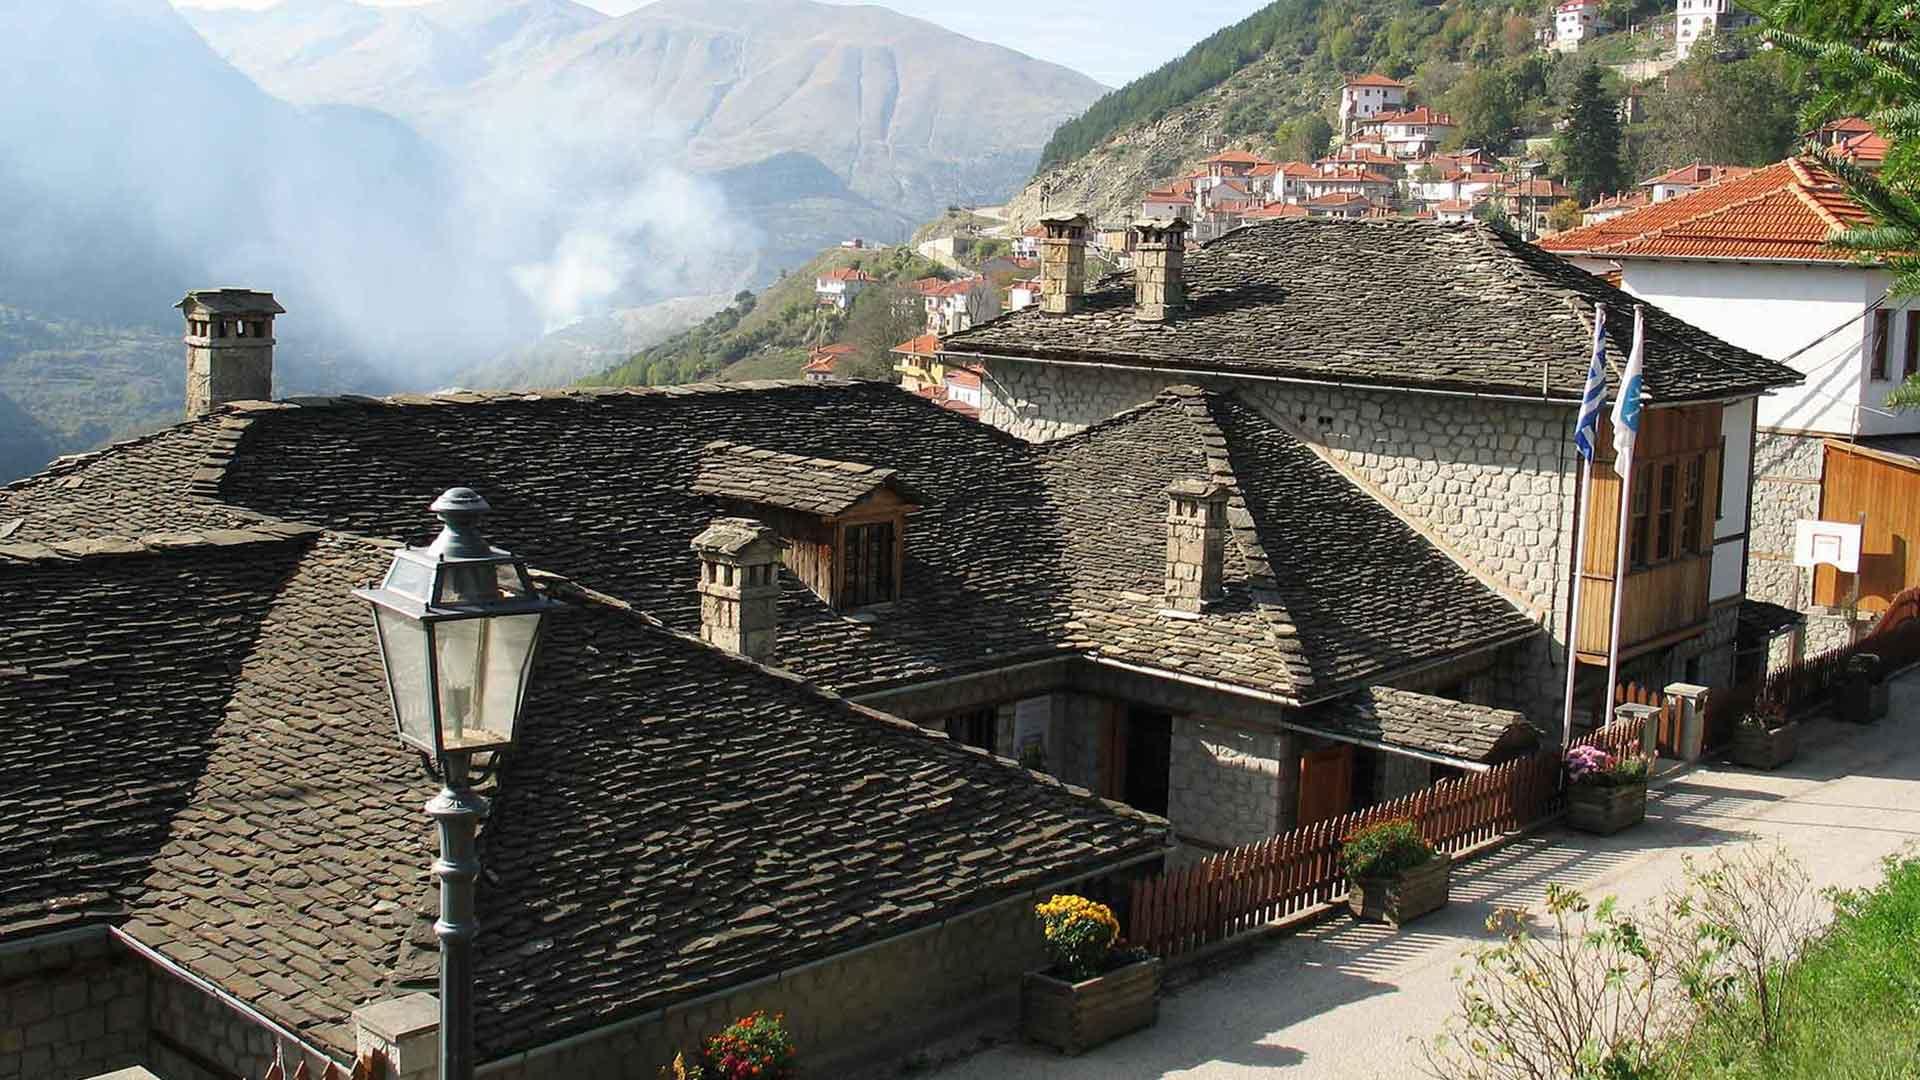 Metsovo: long history of a small mountainous city